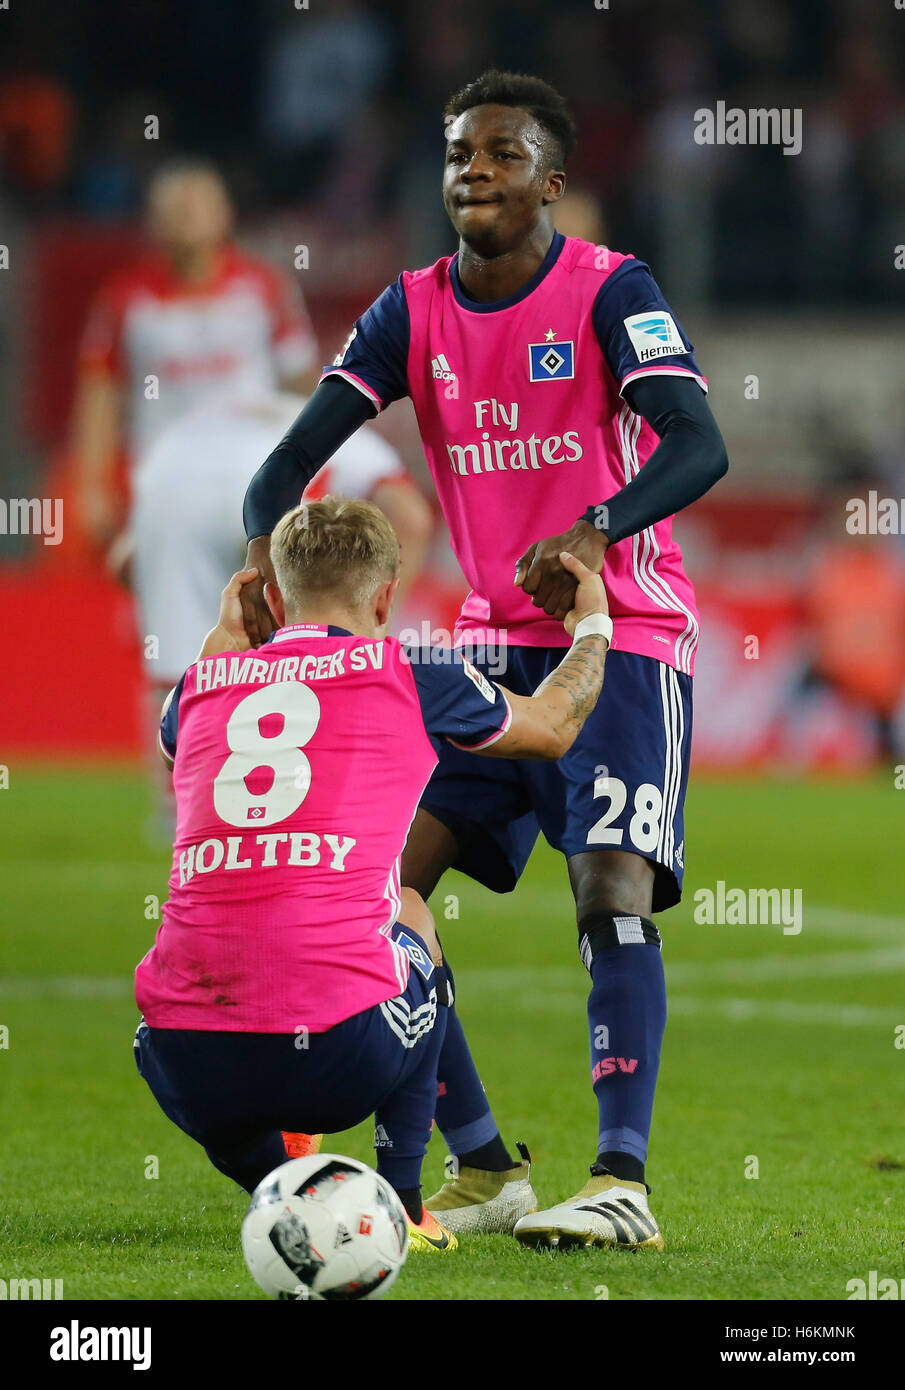 Cologne, Germany 30.10.2016, Bundesliga matchday 9, 1. FC Koeln - Hamburger SV:  Gideon Jung (Hamburg, R) hilft - Stock Image